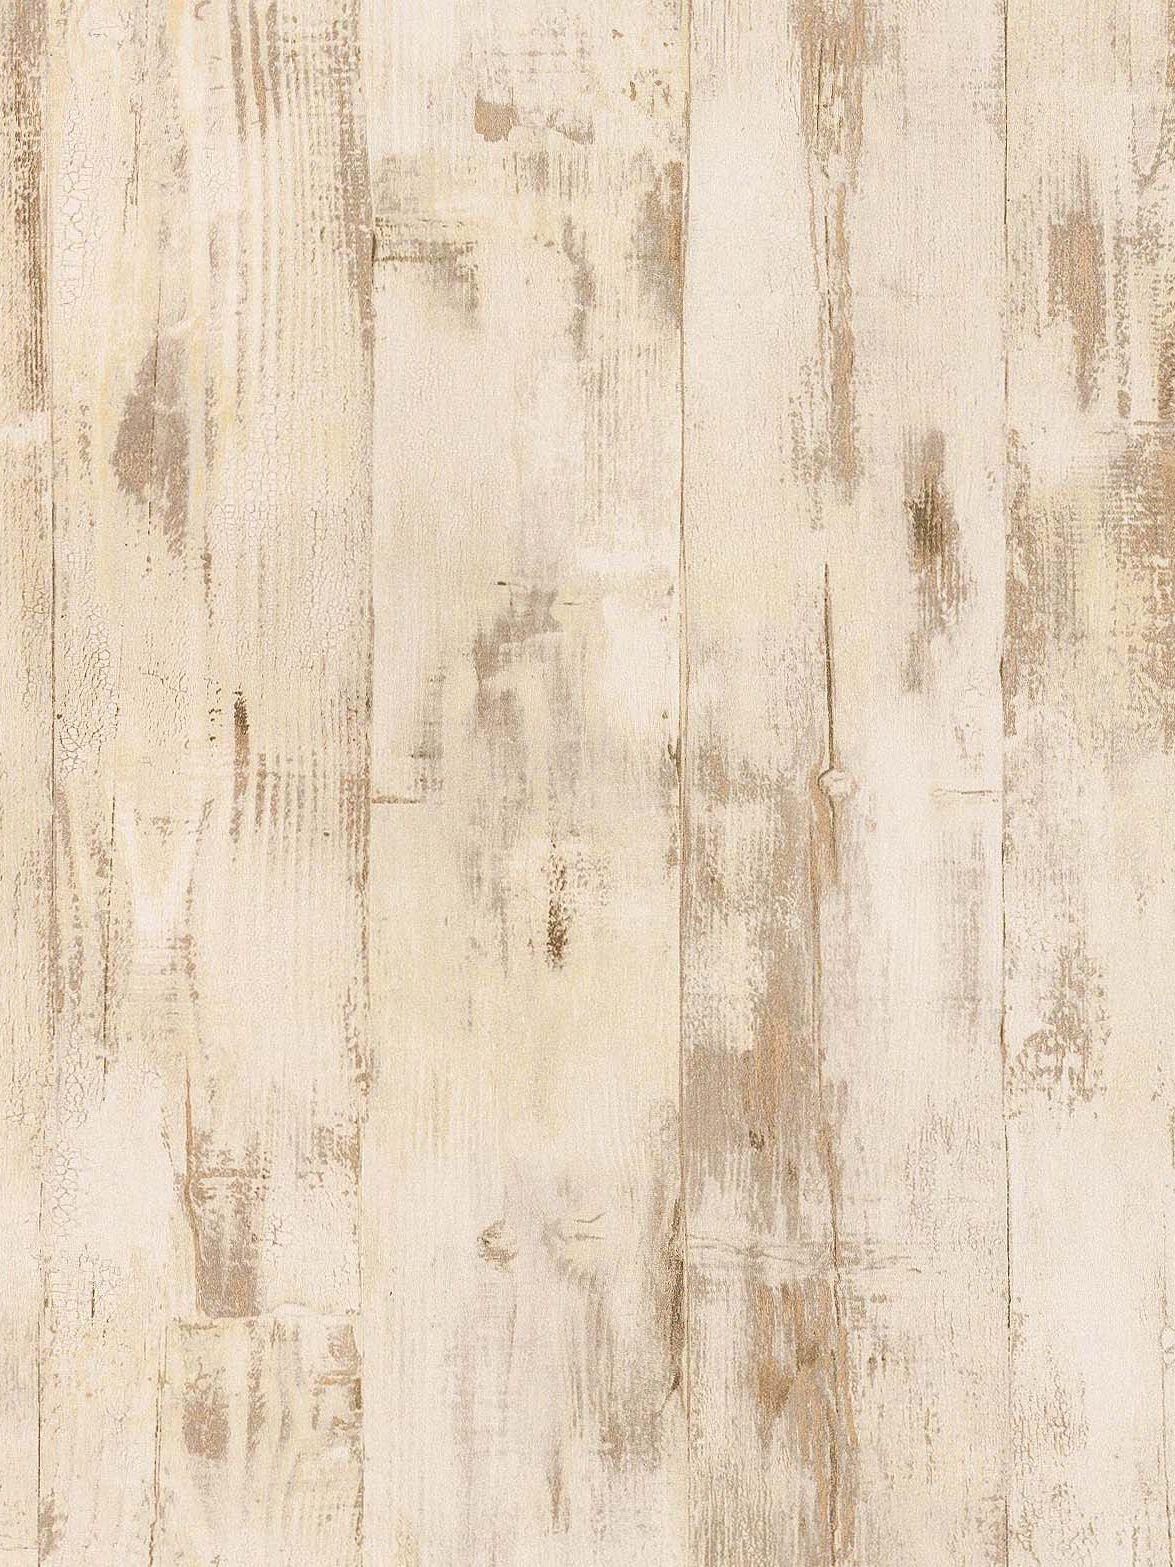 Galerie Galerie Skandinavia Wood Wallpaper